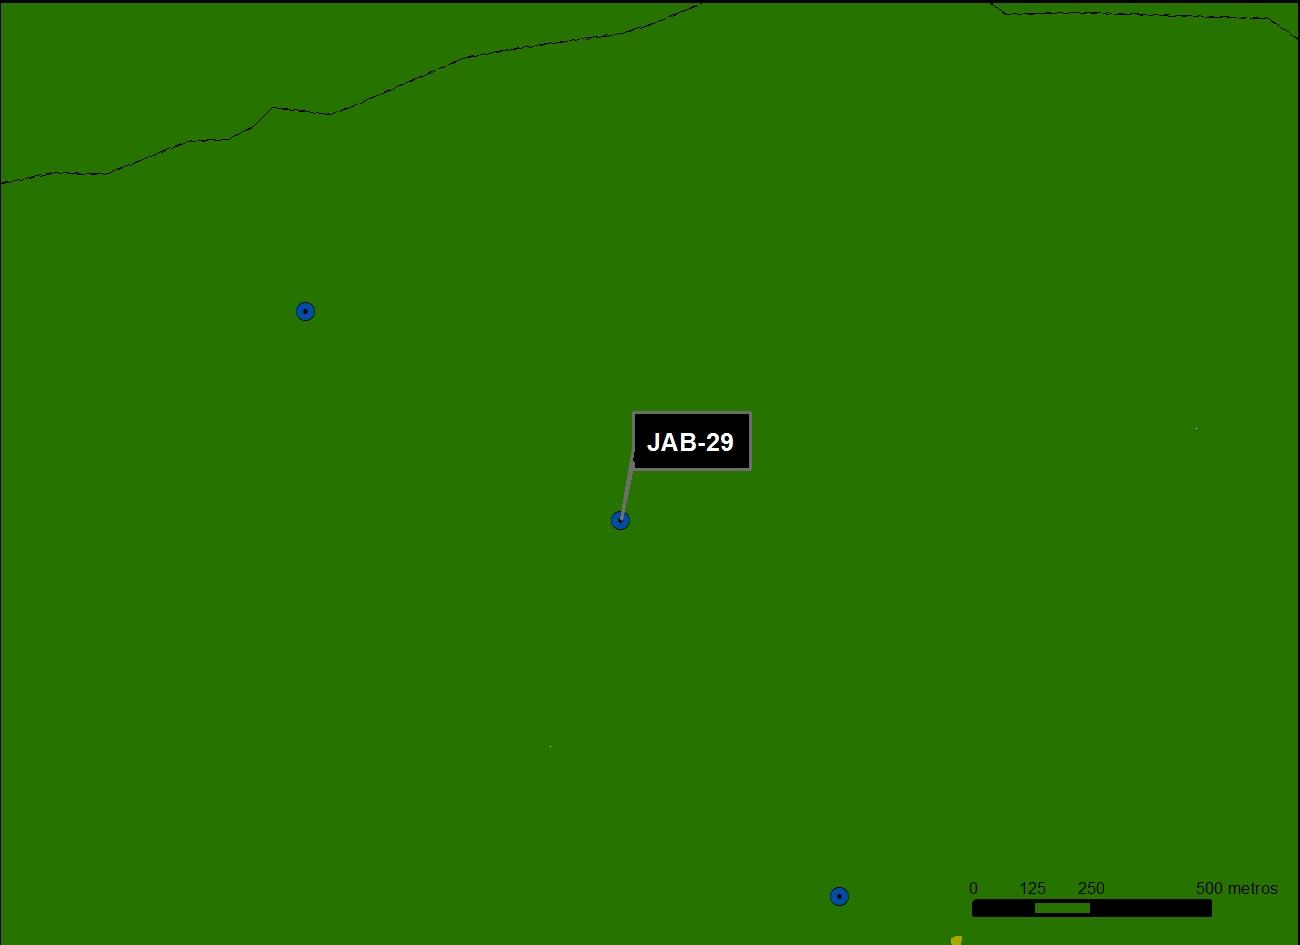 JAB_29_M.V.LOZANO_CANALICA_MAP.VEG